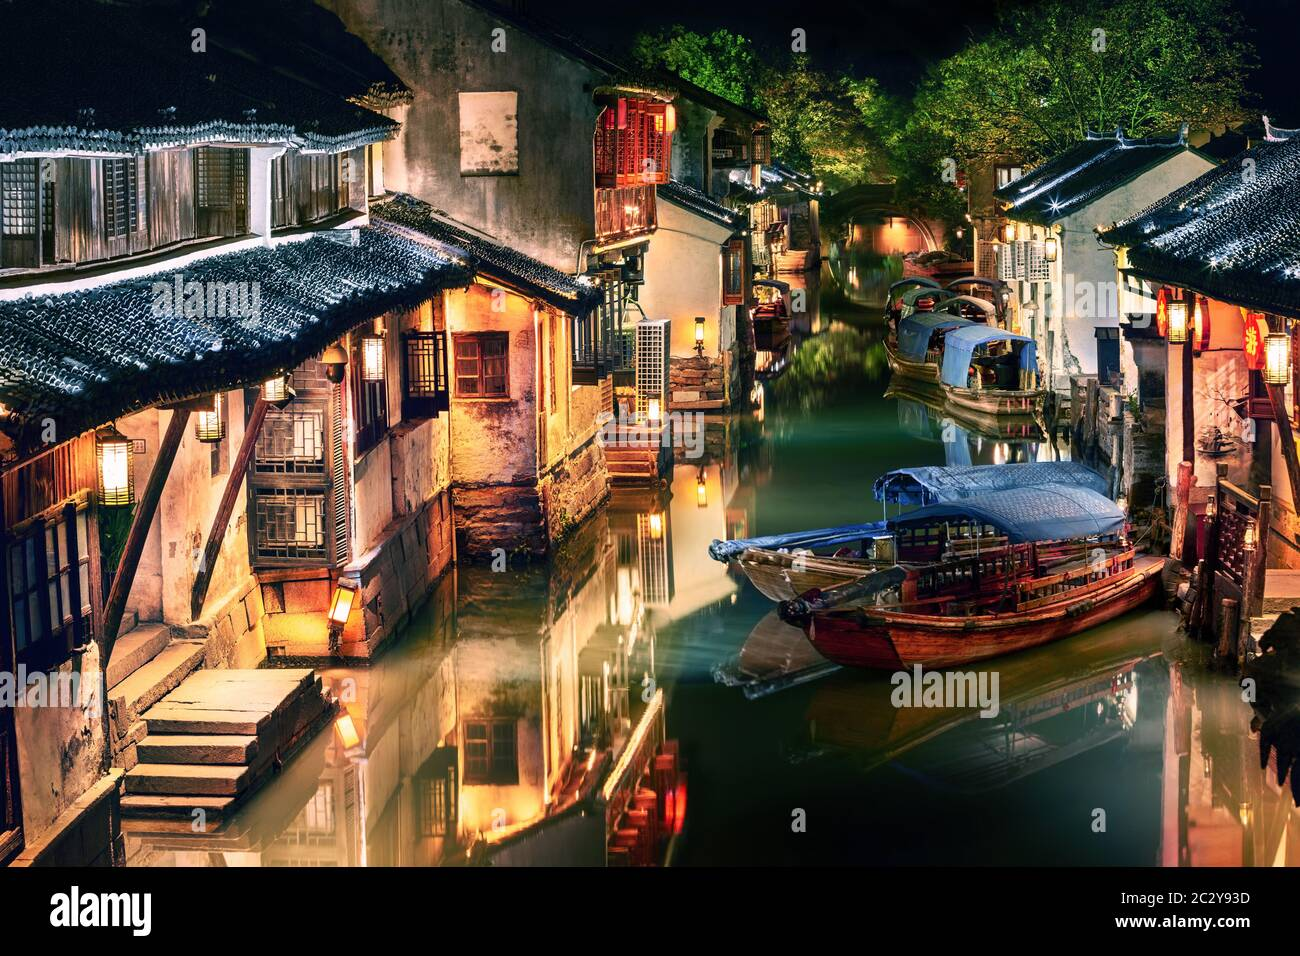 night view of illuminated Zhouzhuang water town, Jiangsu, China Stock Photo